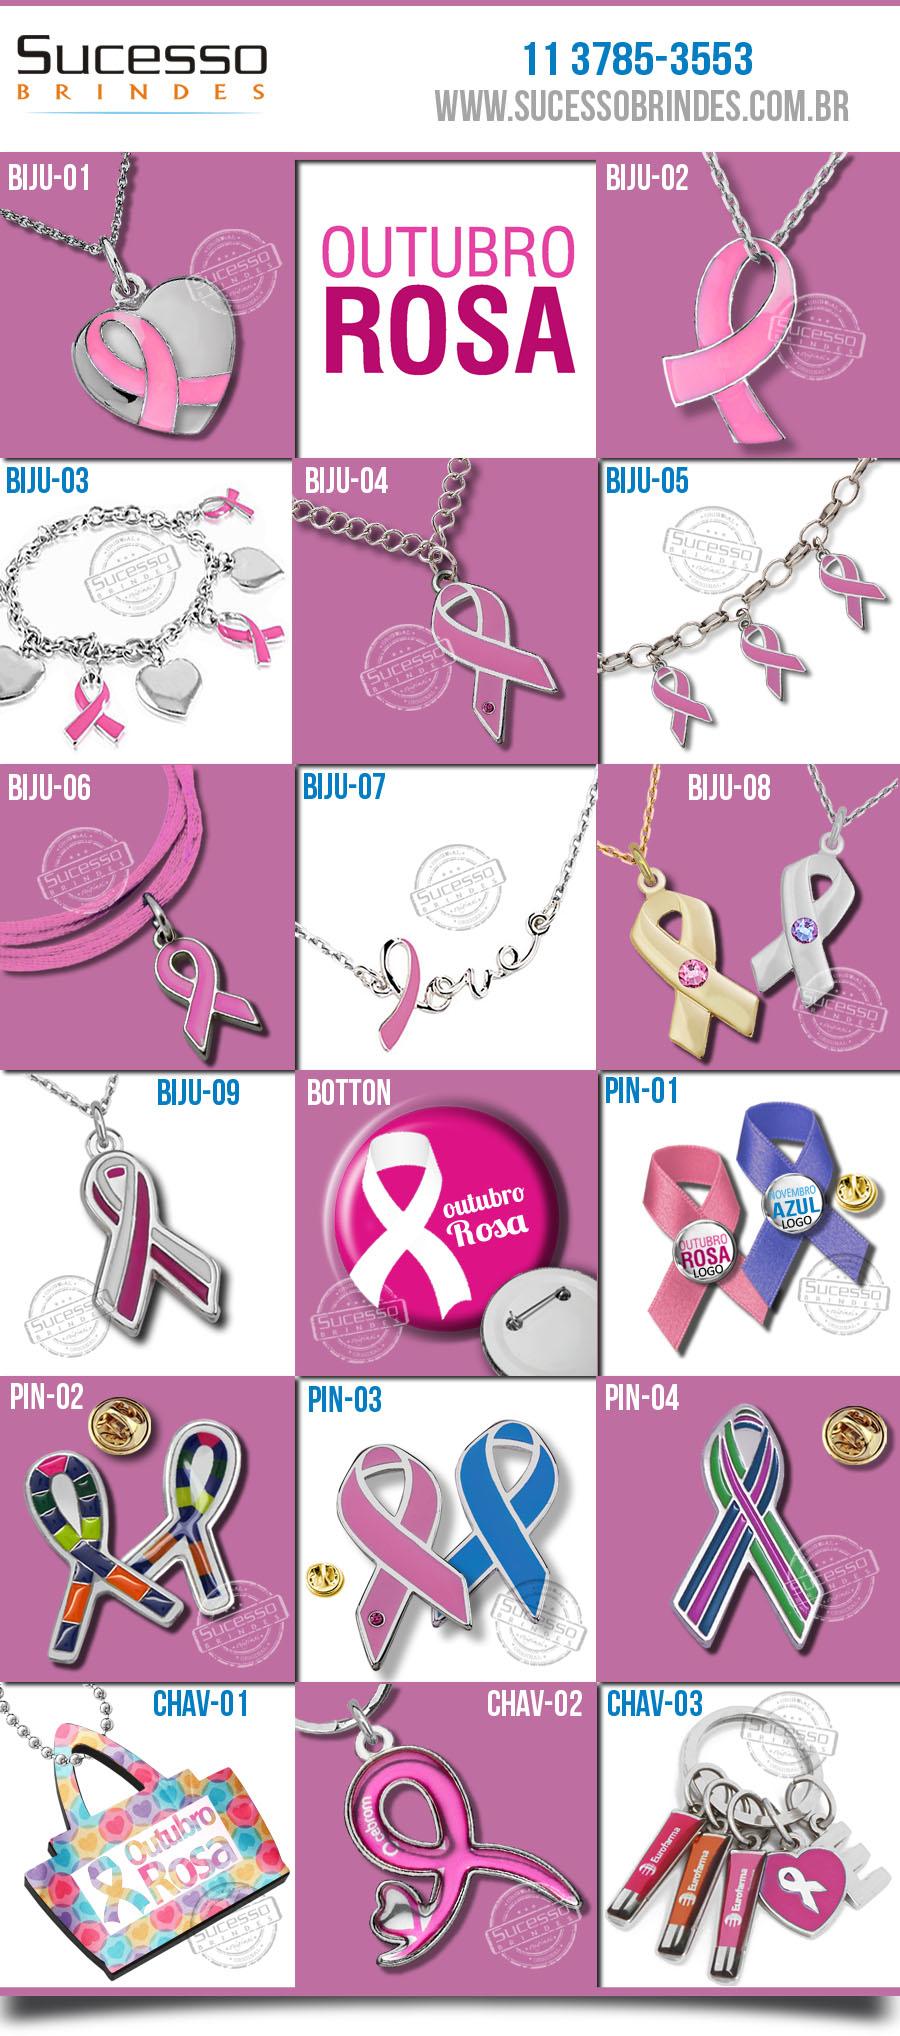 laço cancer outubro rosa